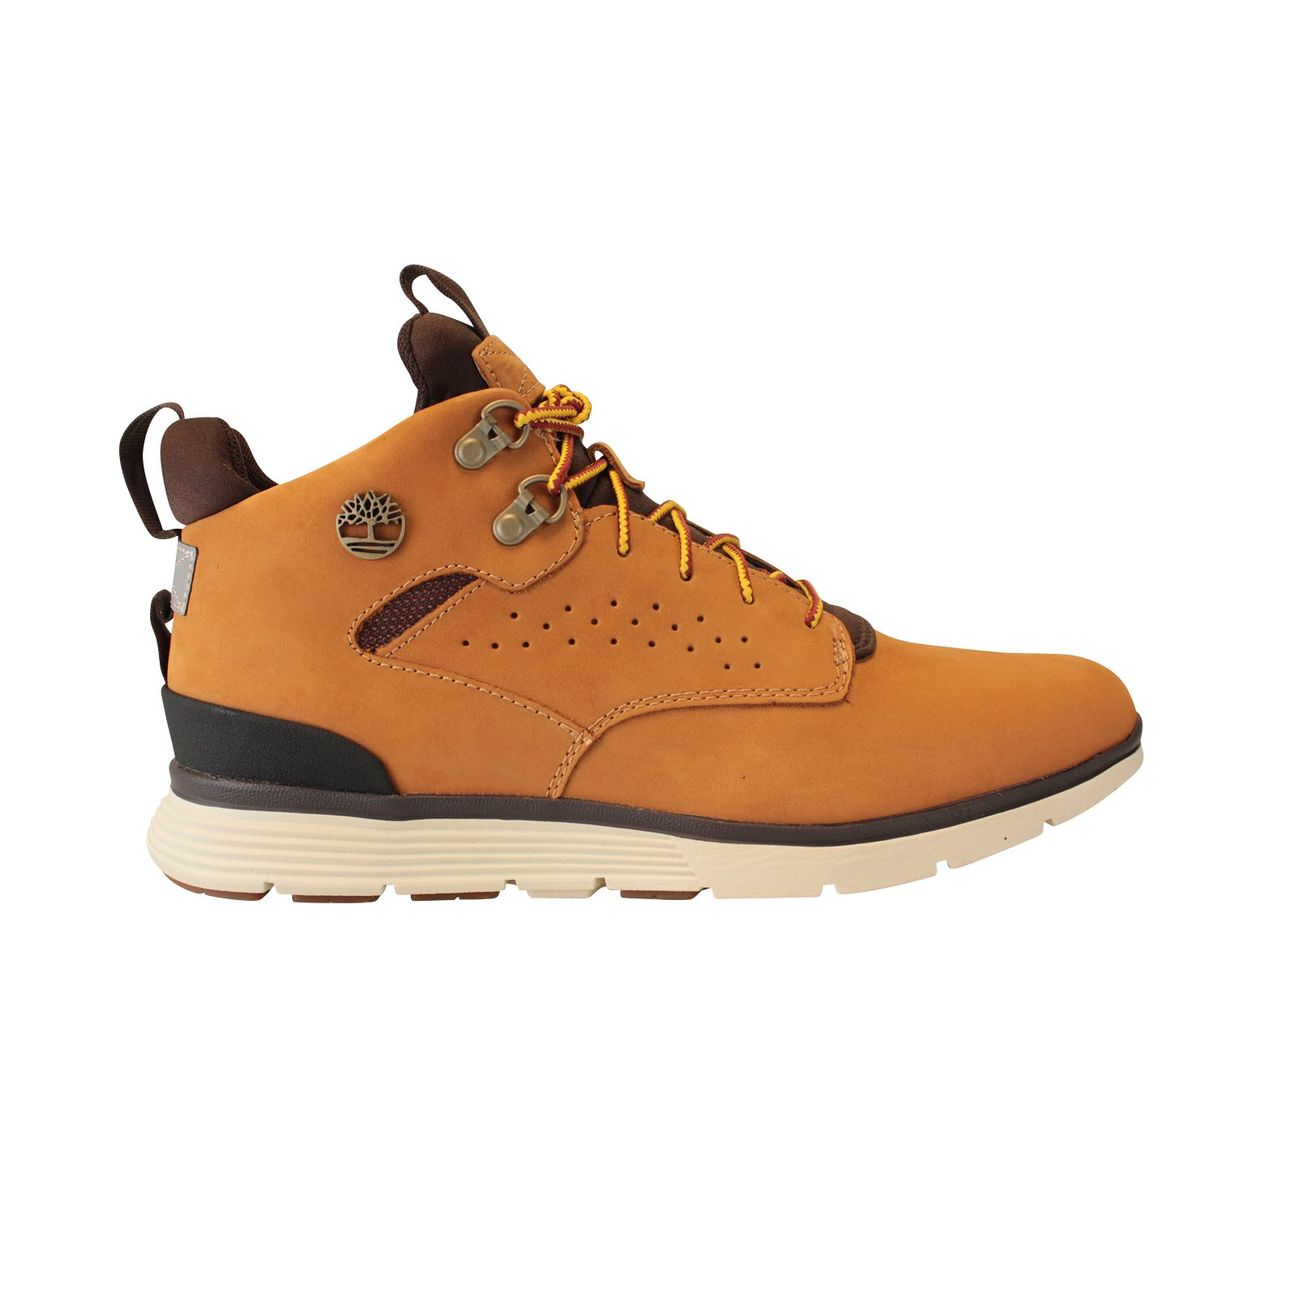 b2ec5f2582e33 Mode- Lifestyle homme TIMBERLAND Timberland Killington Hiker A1JJ1. 21%  Soldes